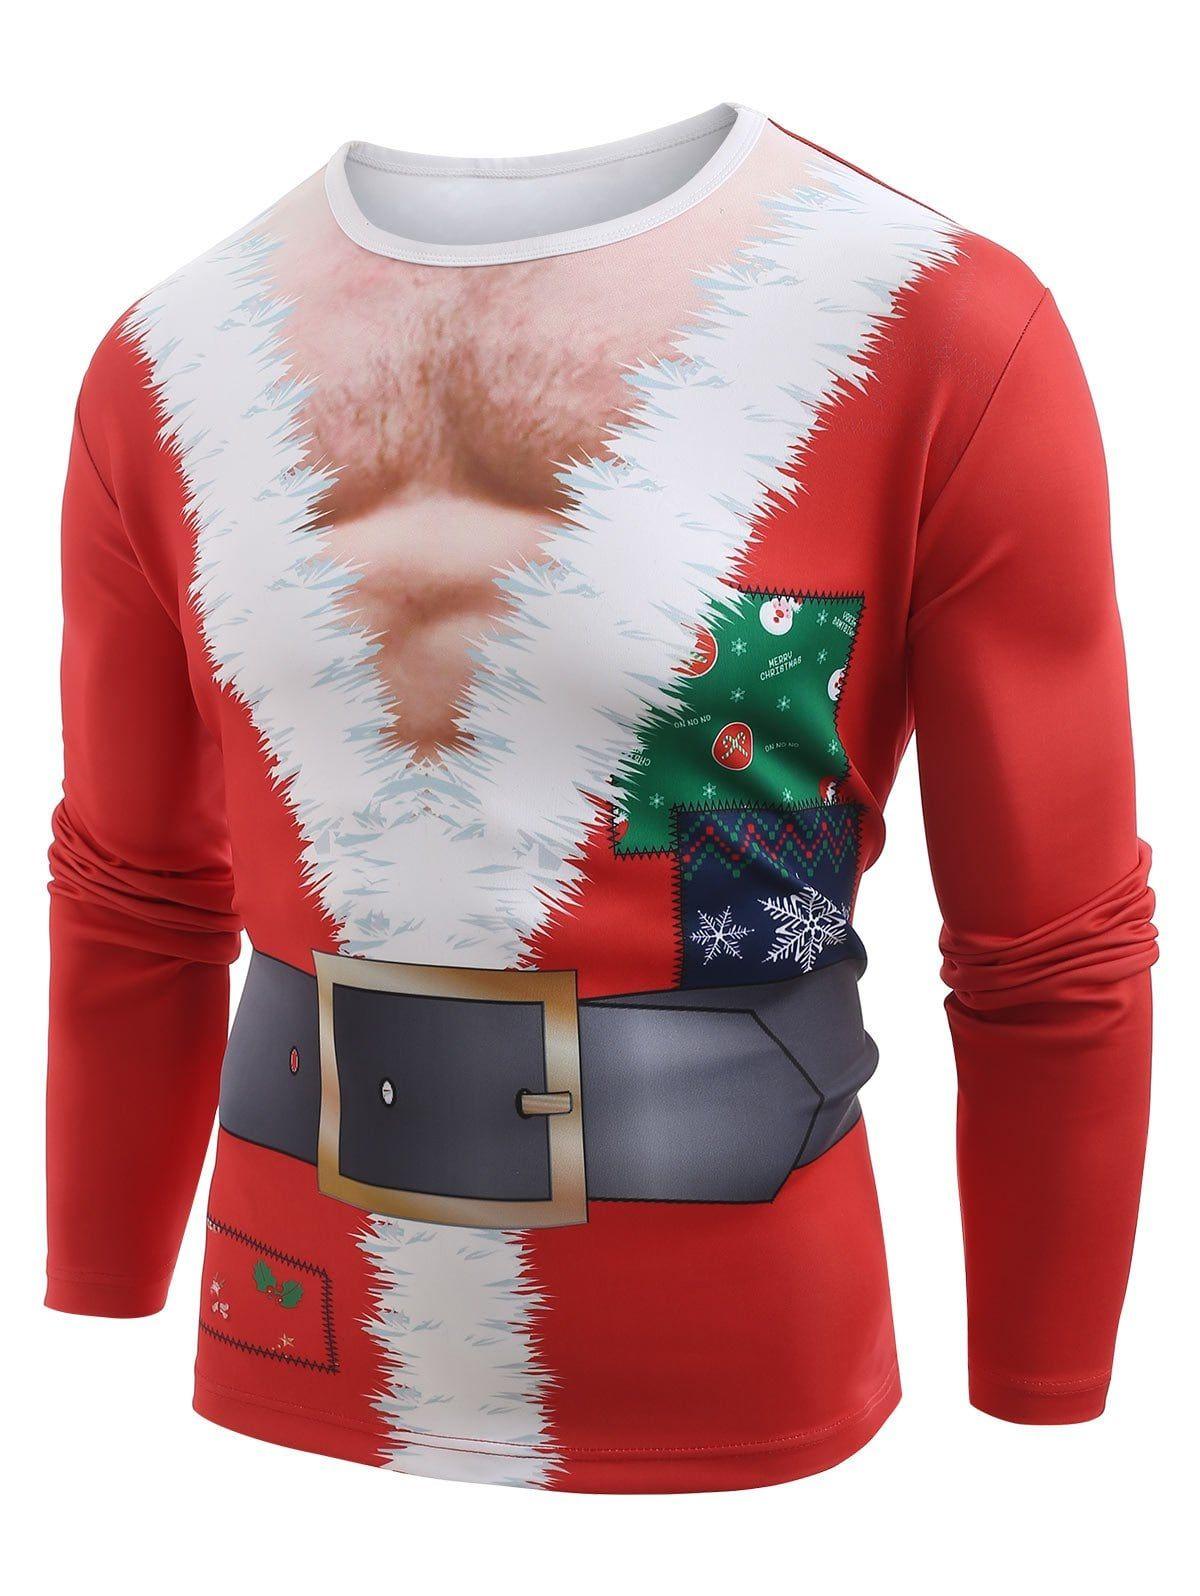 Christmas Fashionable T Shirt,for Men,S